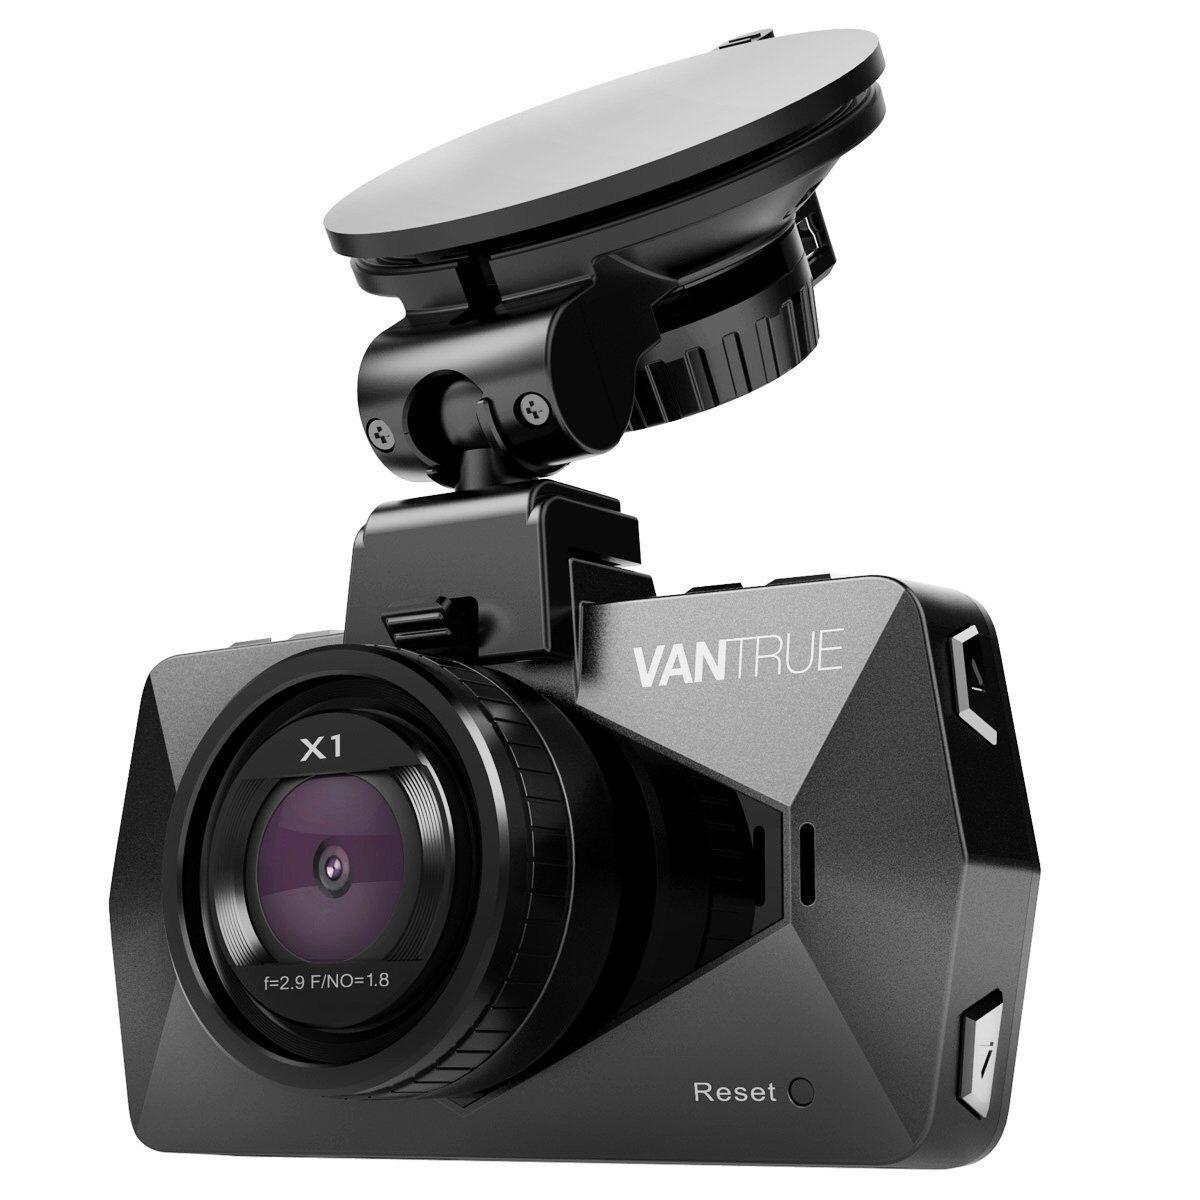 s-l1600 Vantrue X1 Full HD 1080P 170° Wide Angle Dash Cam Dashboard Video Camera DVR